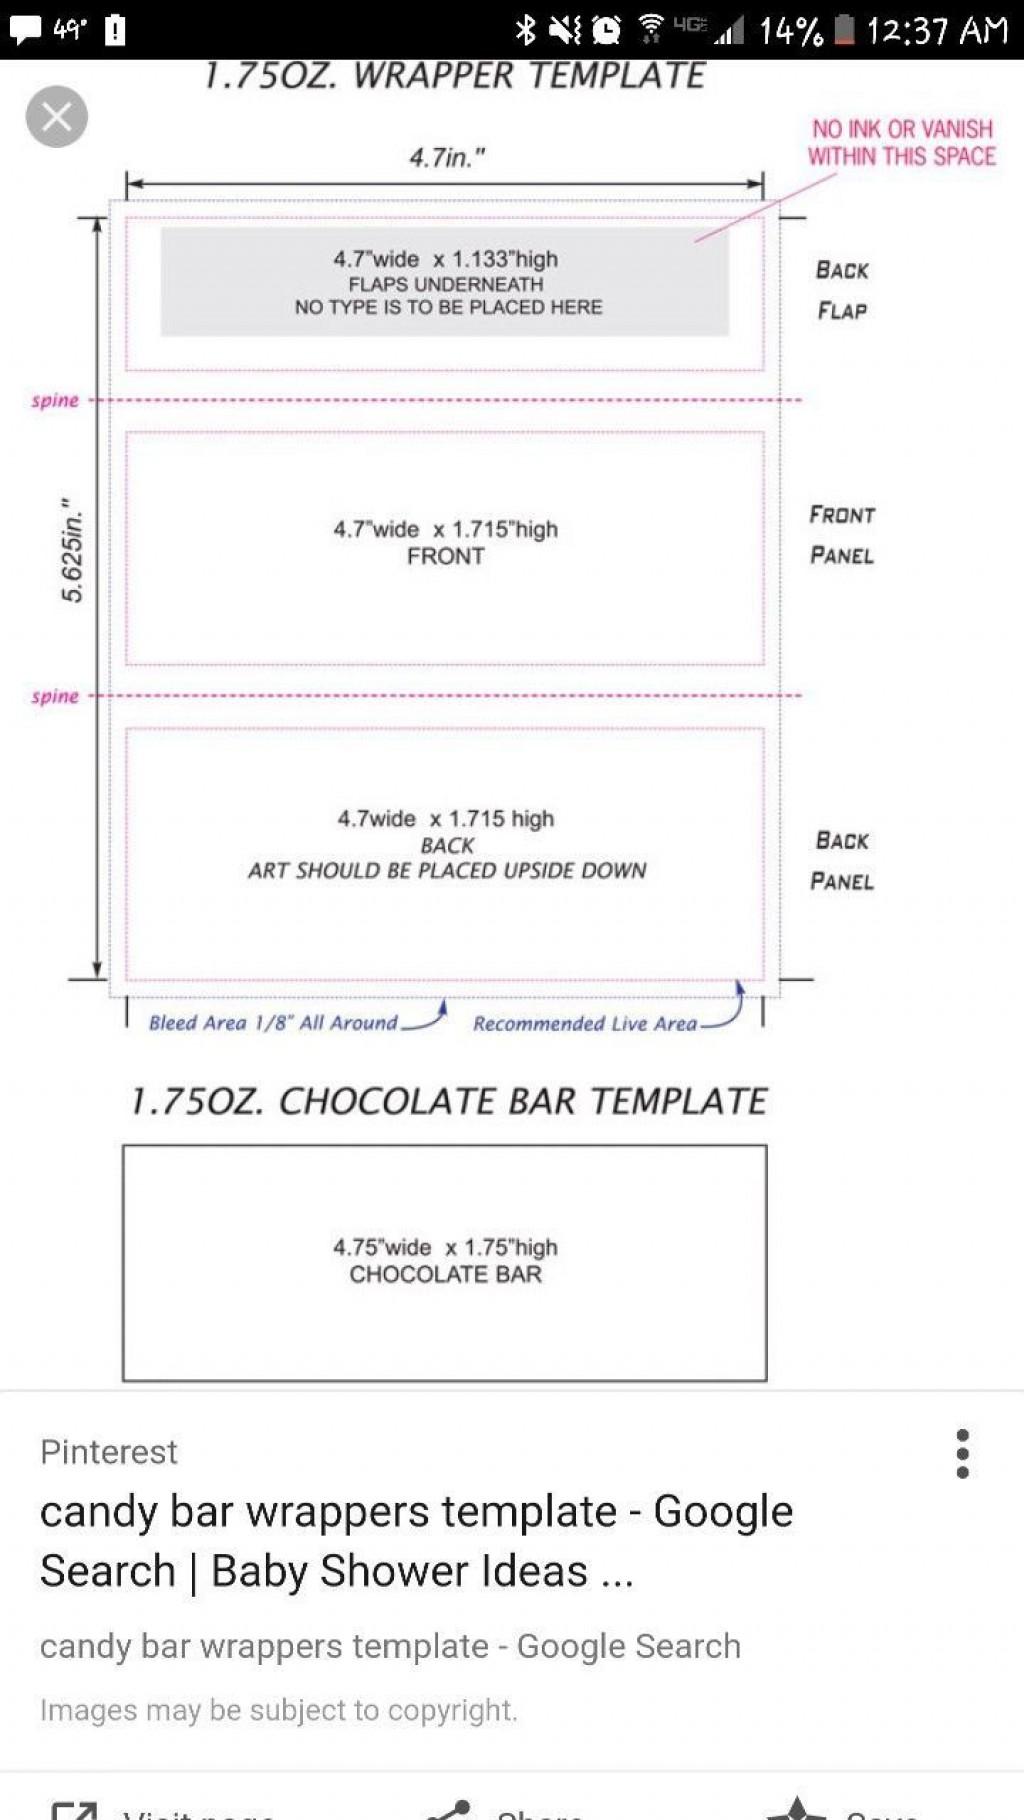 005 Impressive Hershey Candy Bar Wrapper Template Image  Free WordLarge